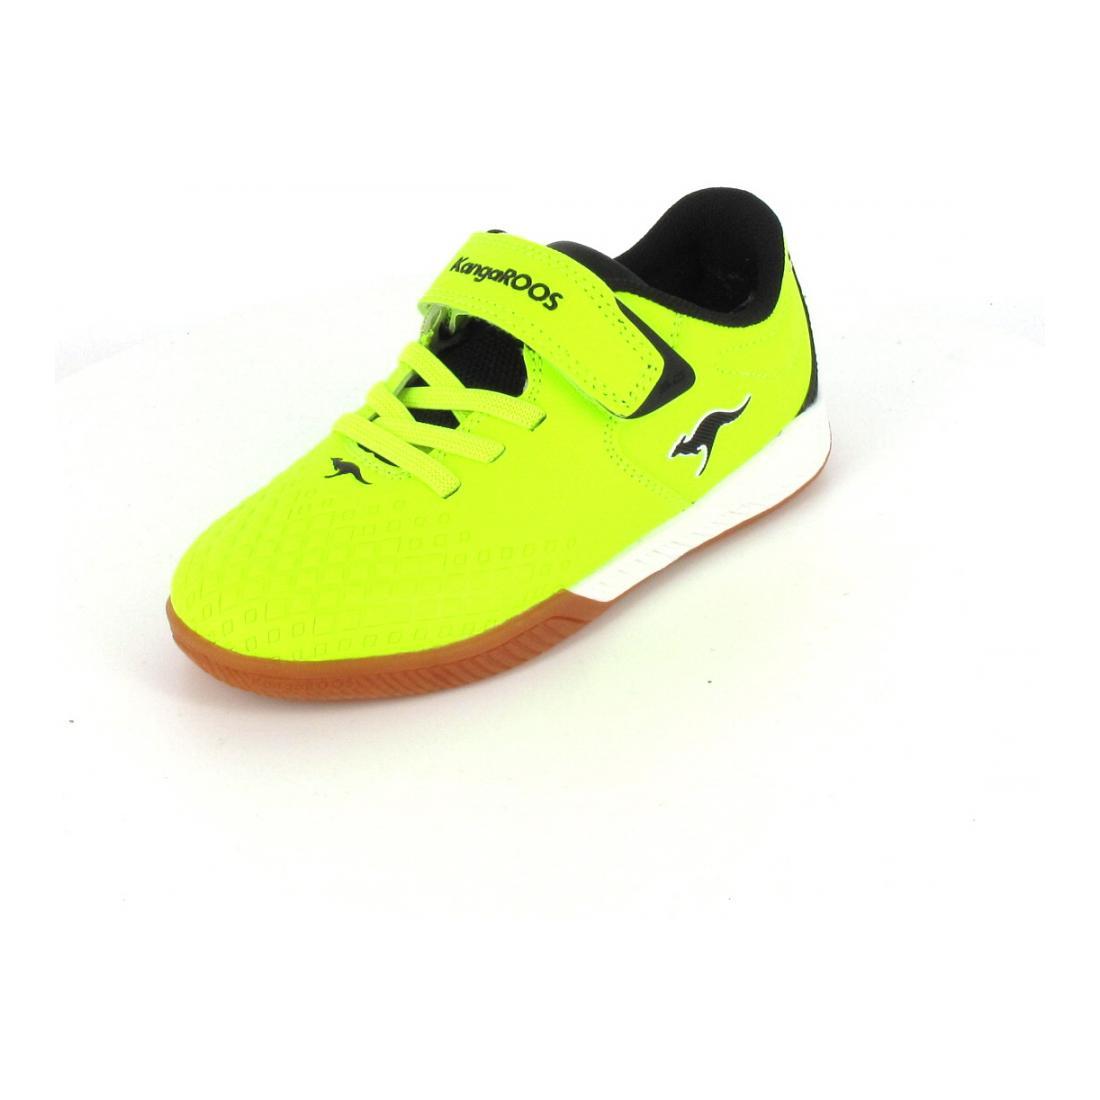 KangaRoos Sneaker K5-Comb EV